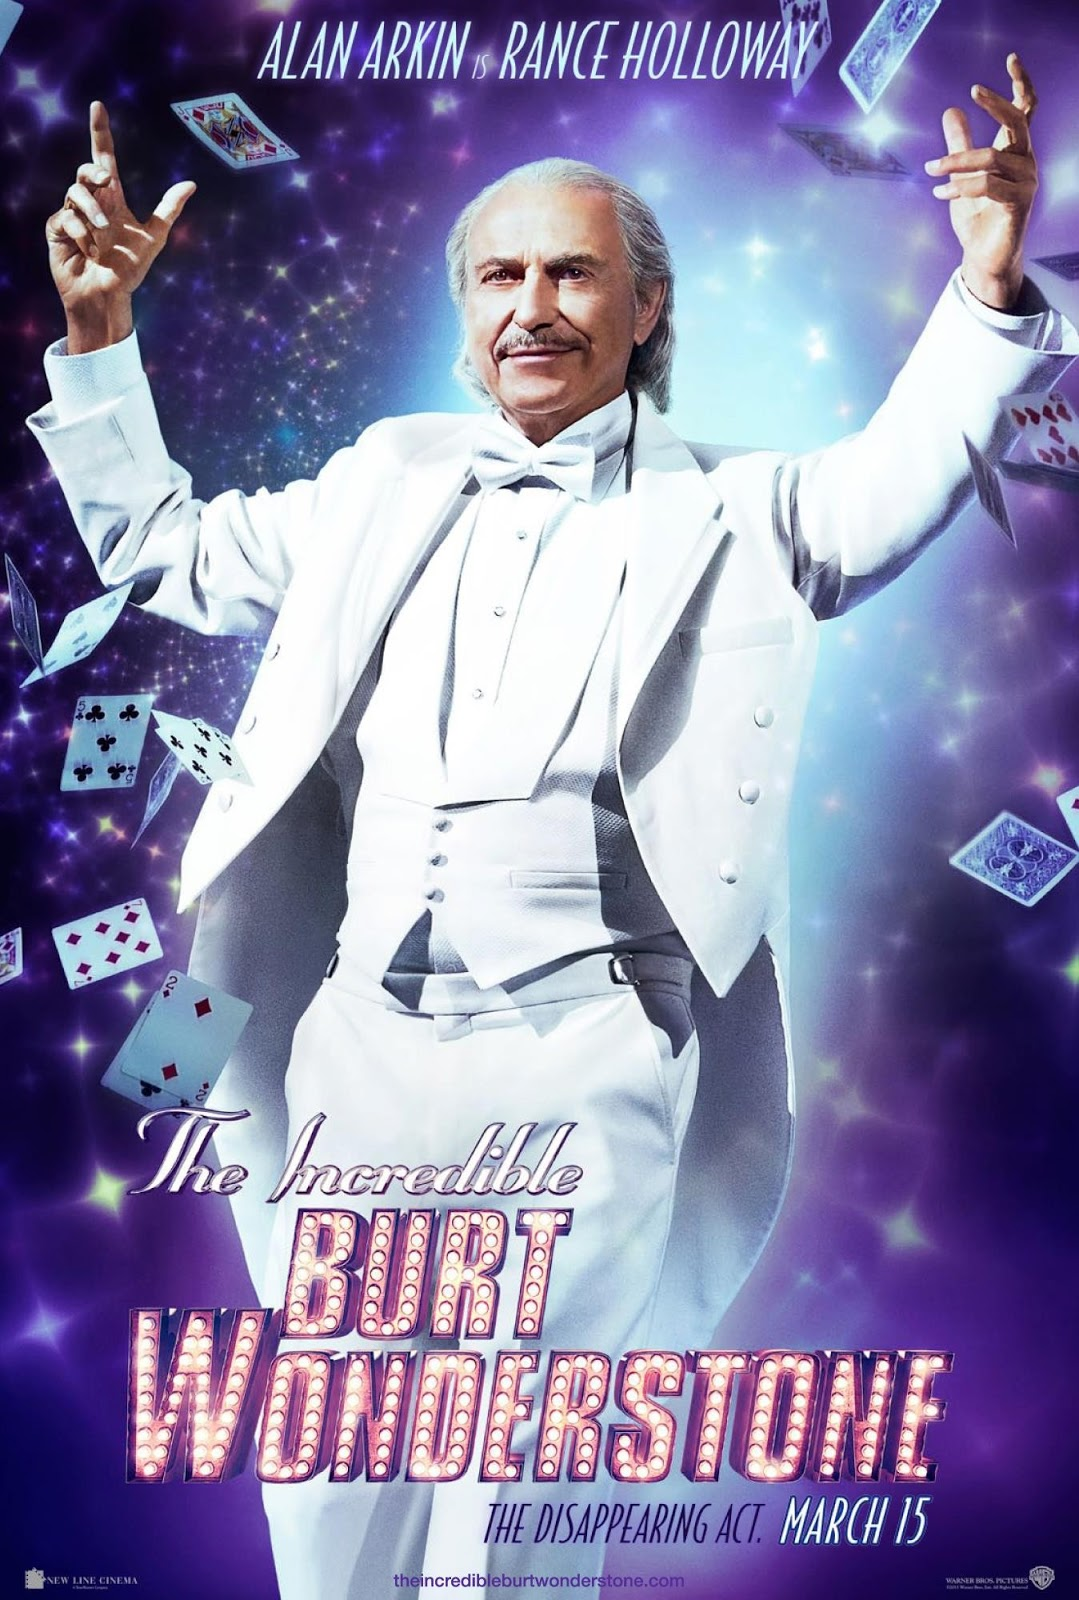 http://3.bp.blogspot.com/-WBVCTBZ1xXg/USiOESBw_XI/AAAAAAAAy4U/msywXWazwMM/s1600/The-Incredible-Burt-Wonderston-Poster-010.jpg